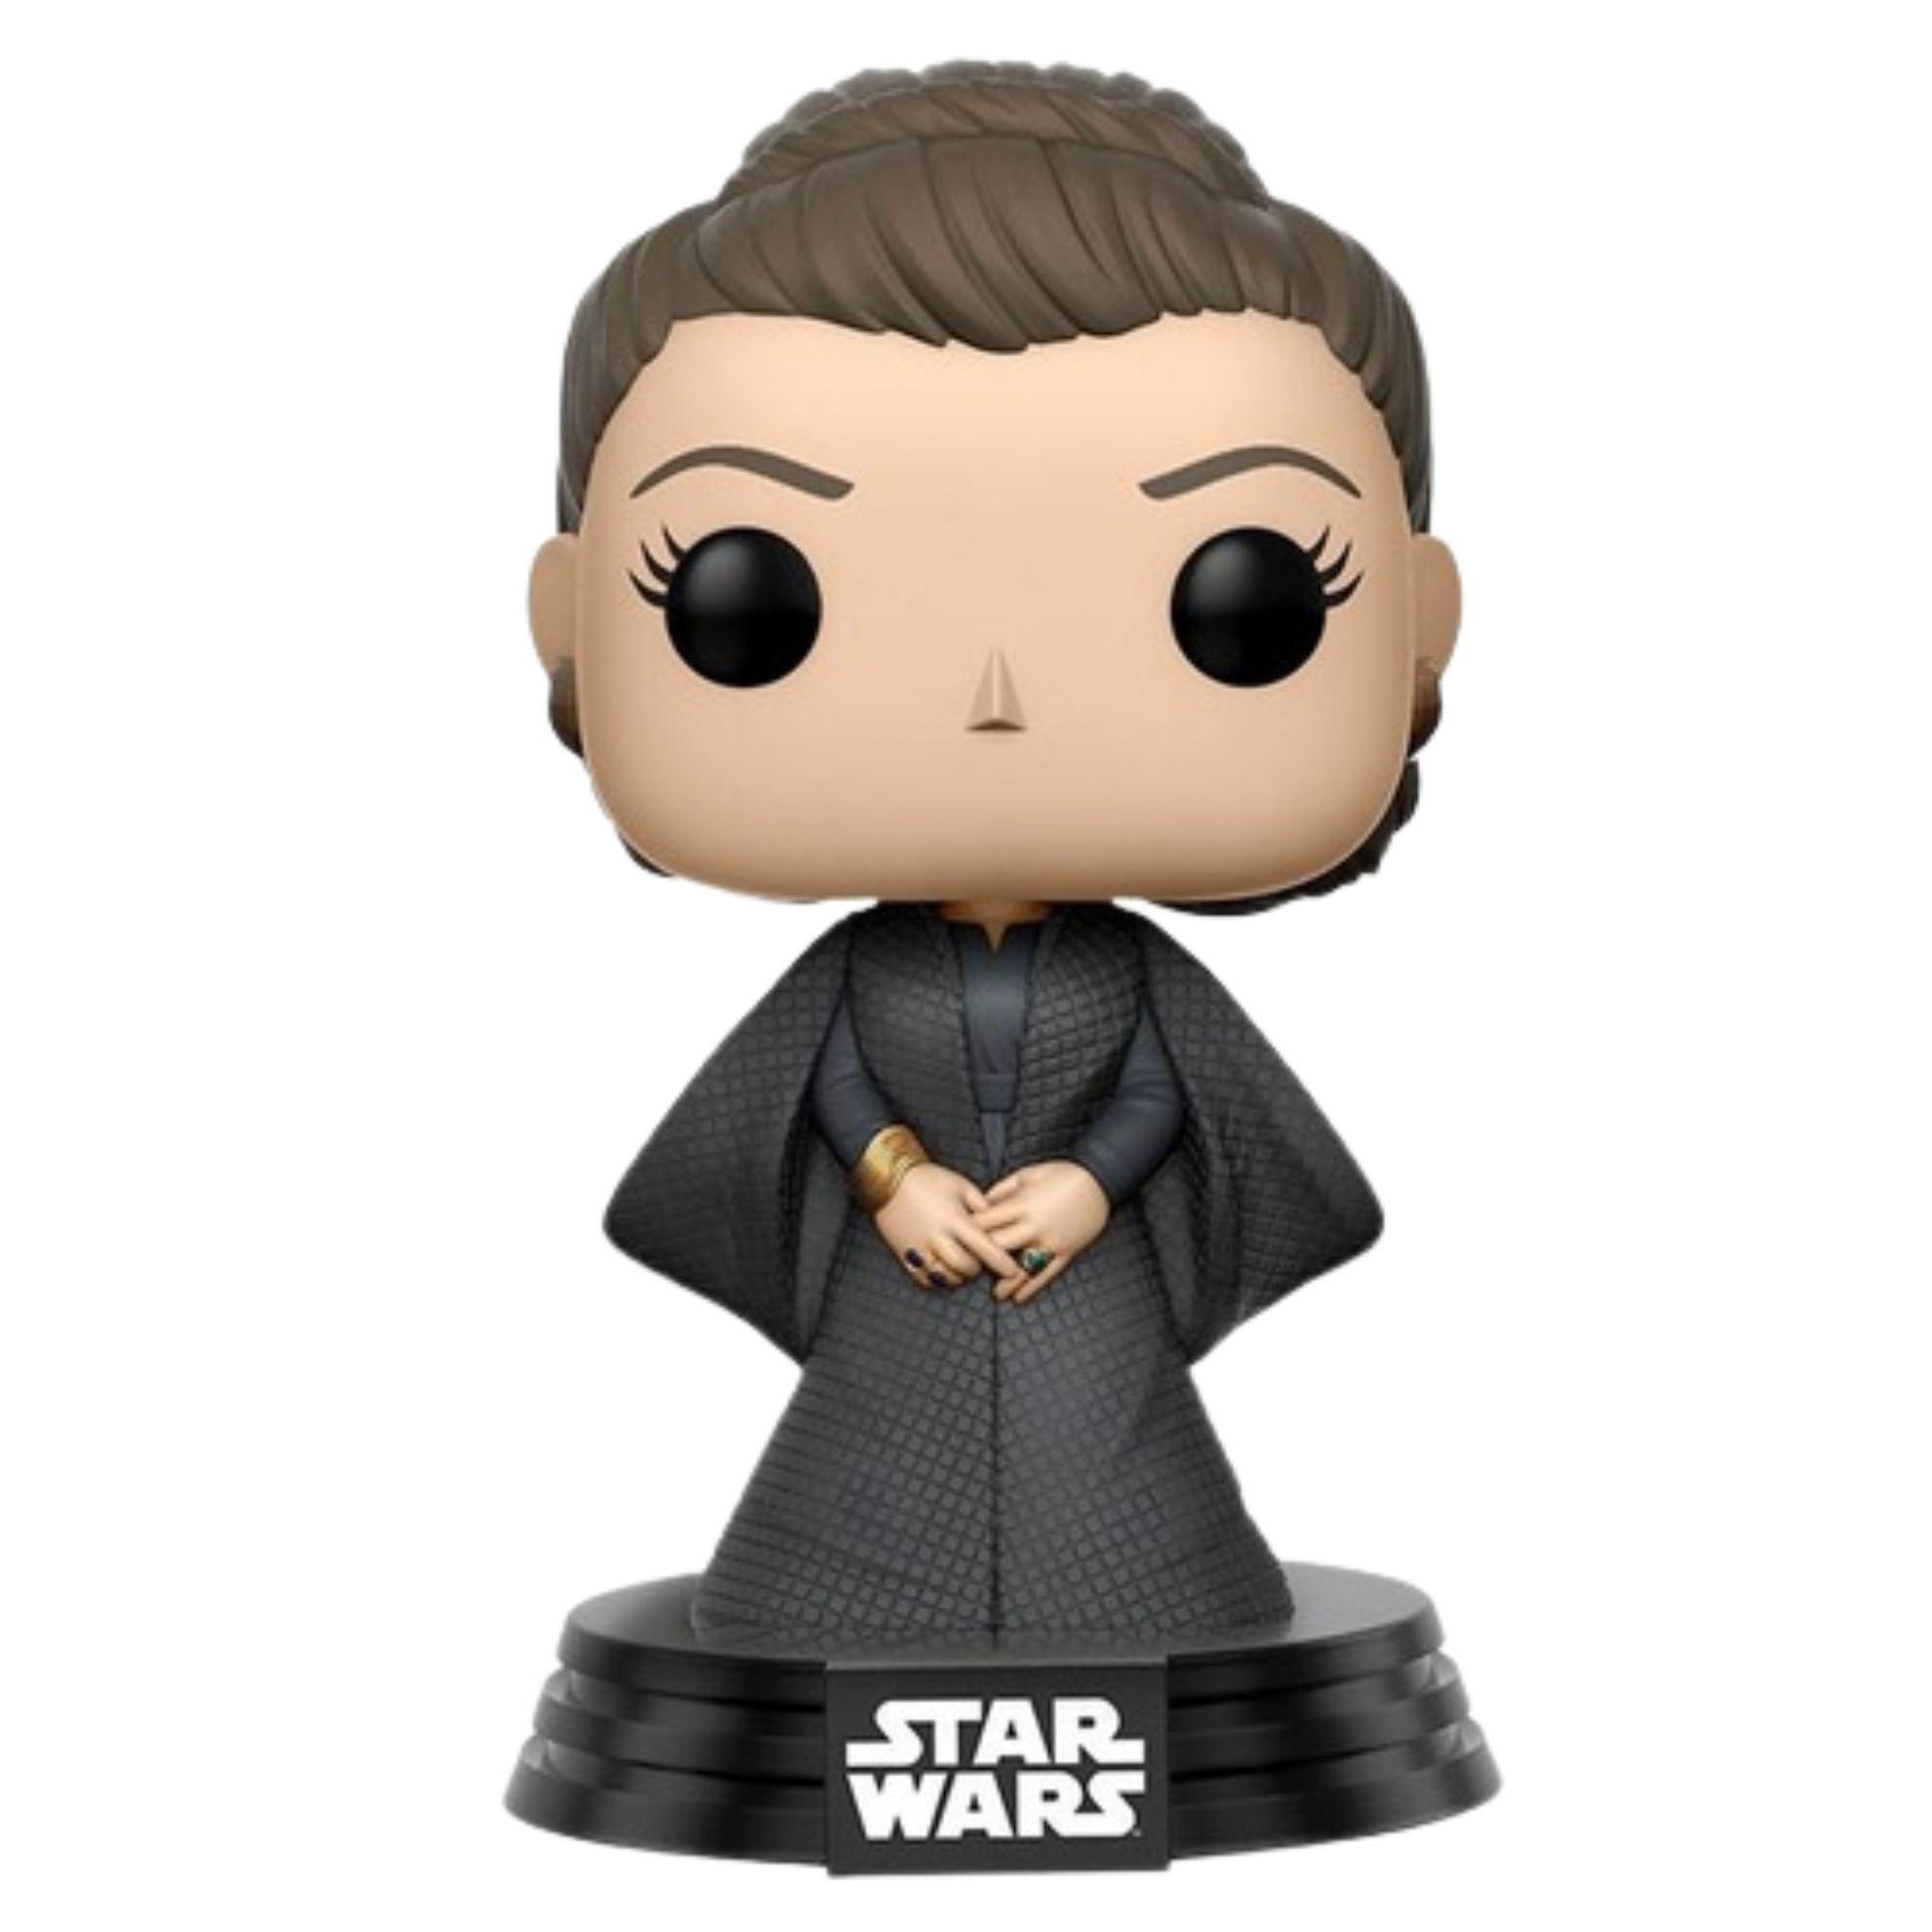 Funko Pop Star Wars Princesa Leia Exclusivo Walmart #218  - Game Land Brinquedos